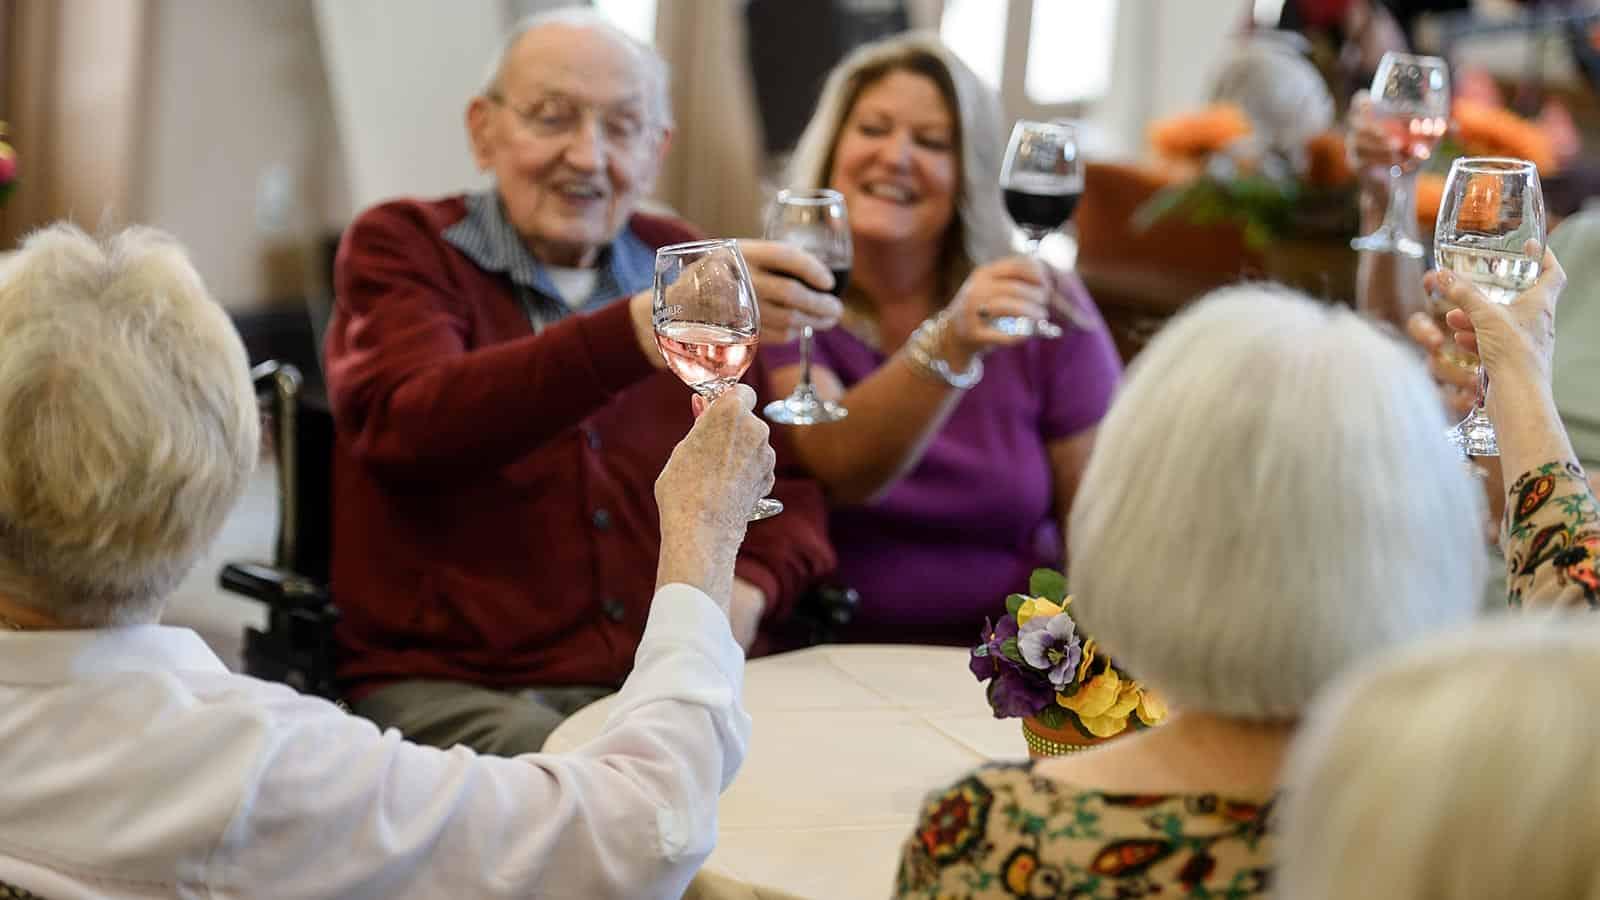 Senior group toasting wine